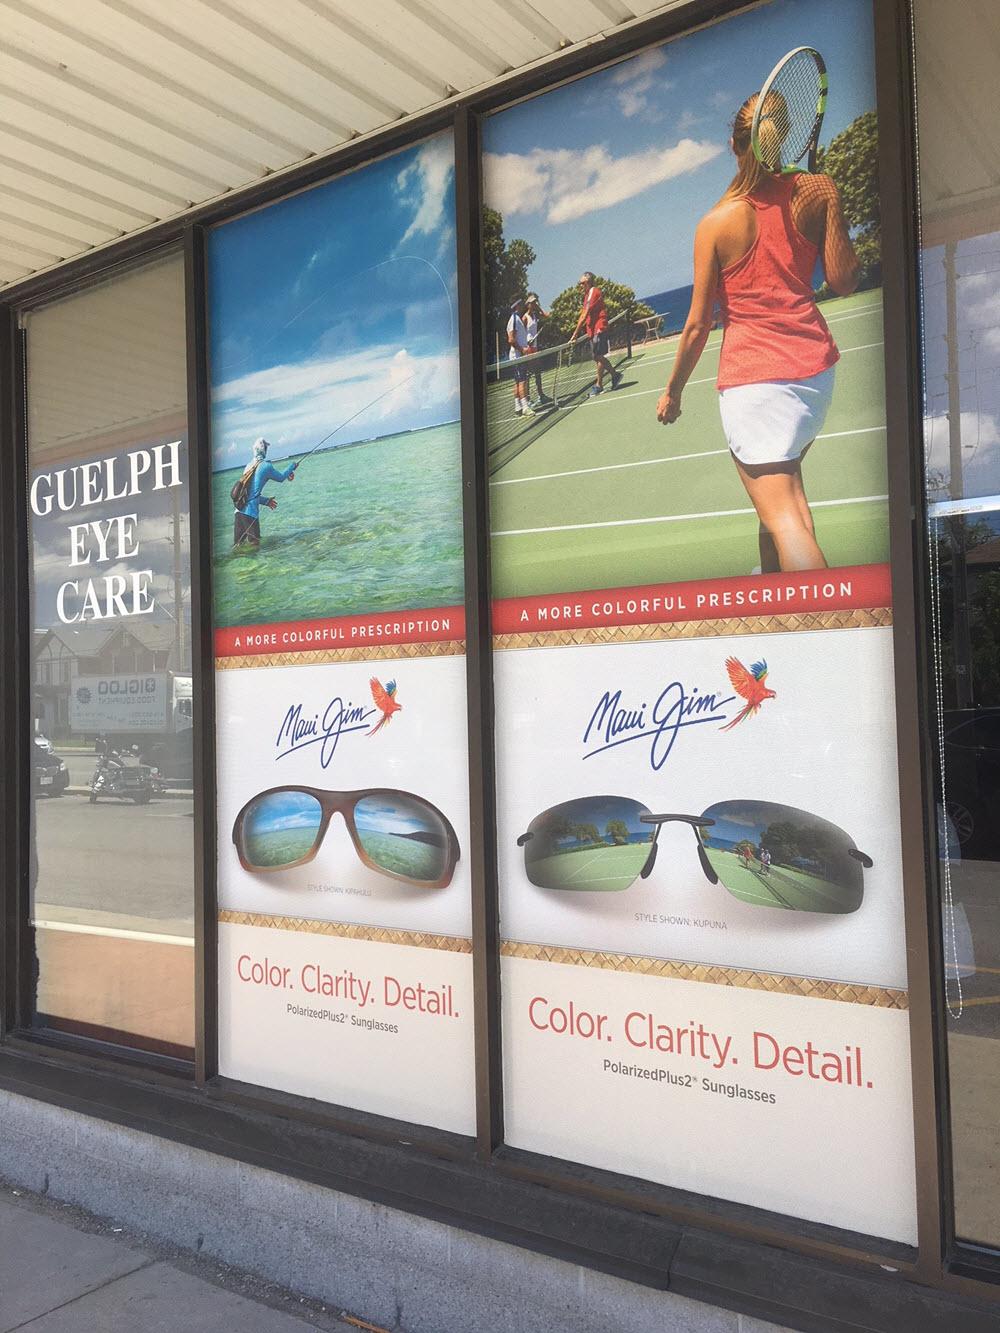 Guelph Eye Care